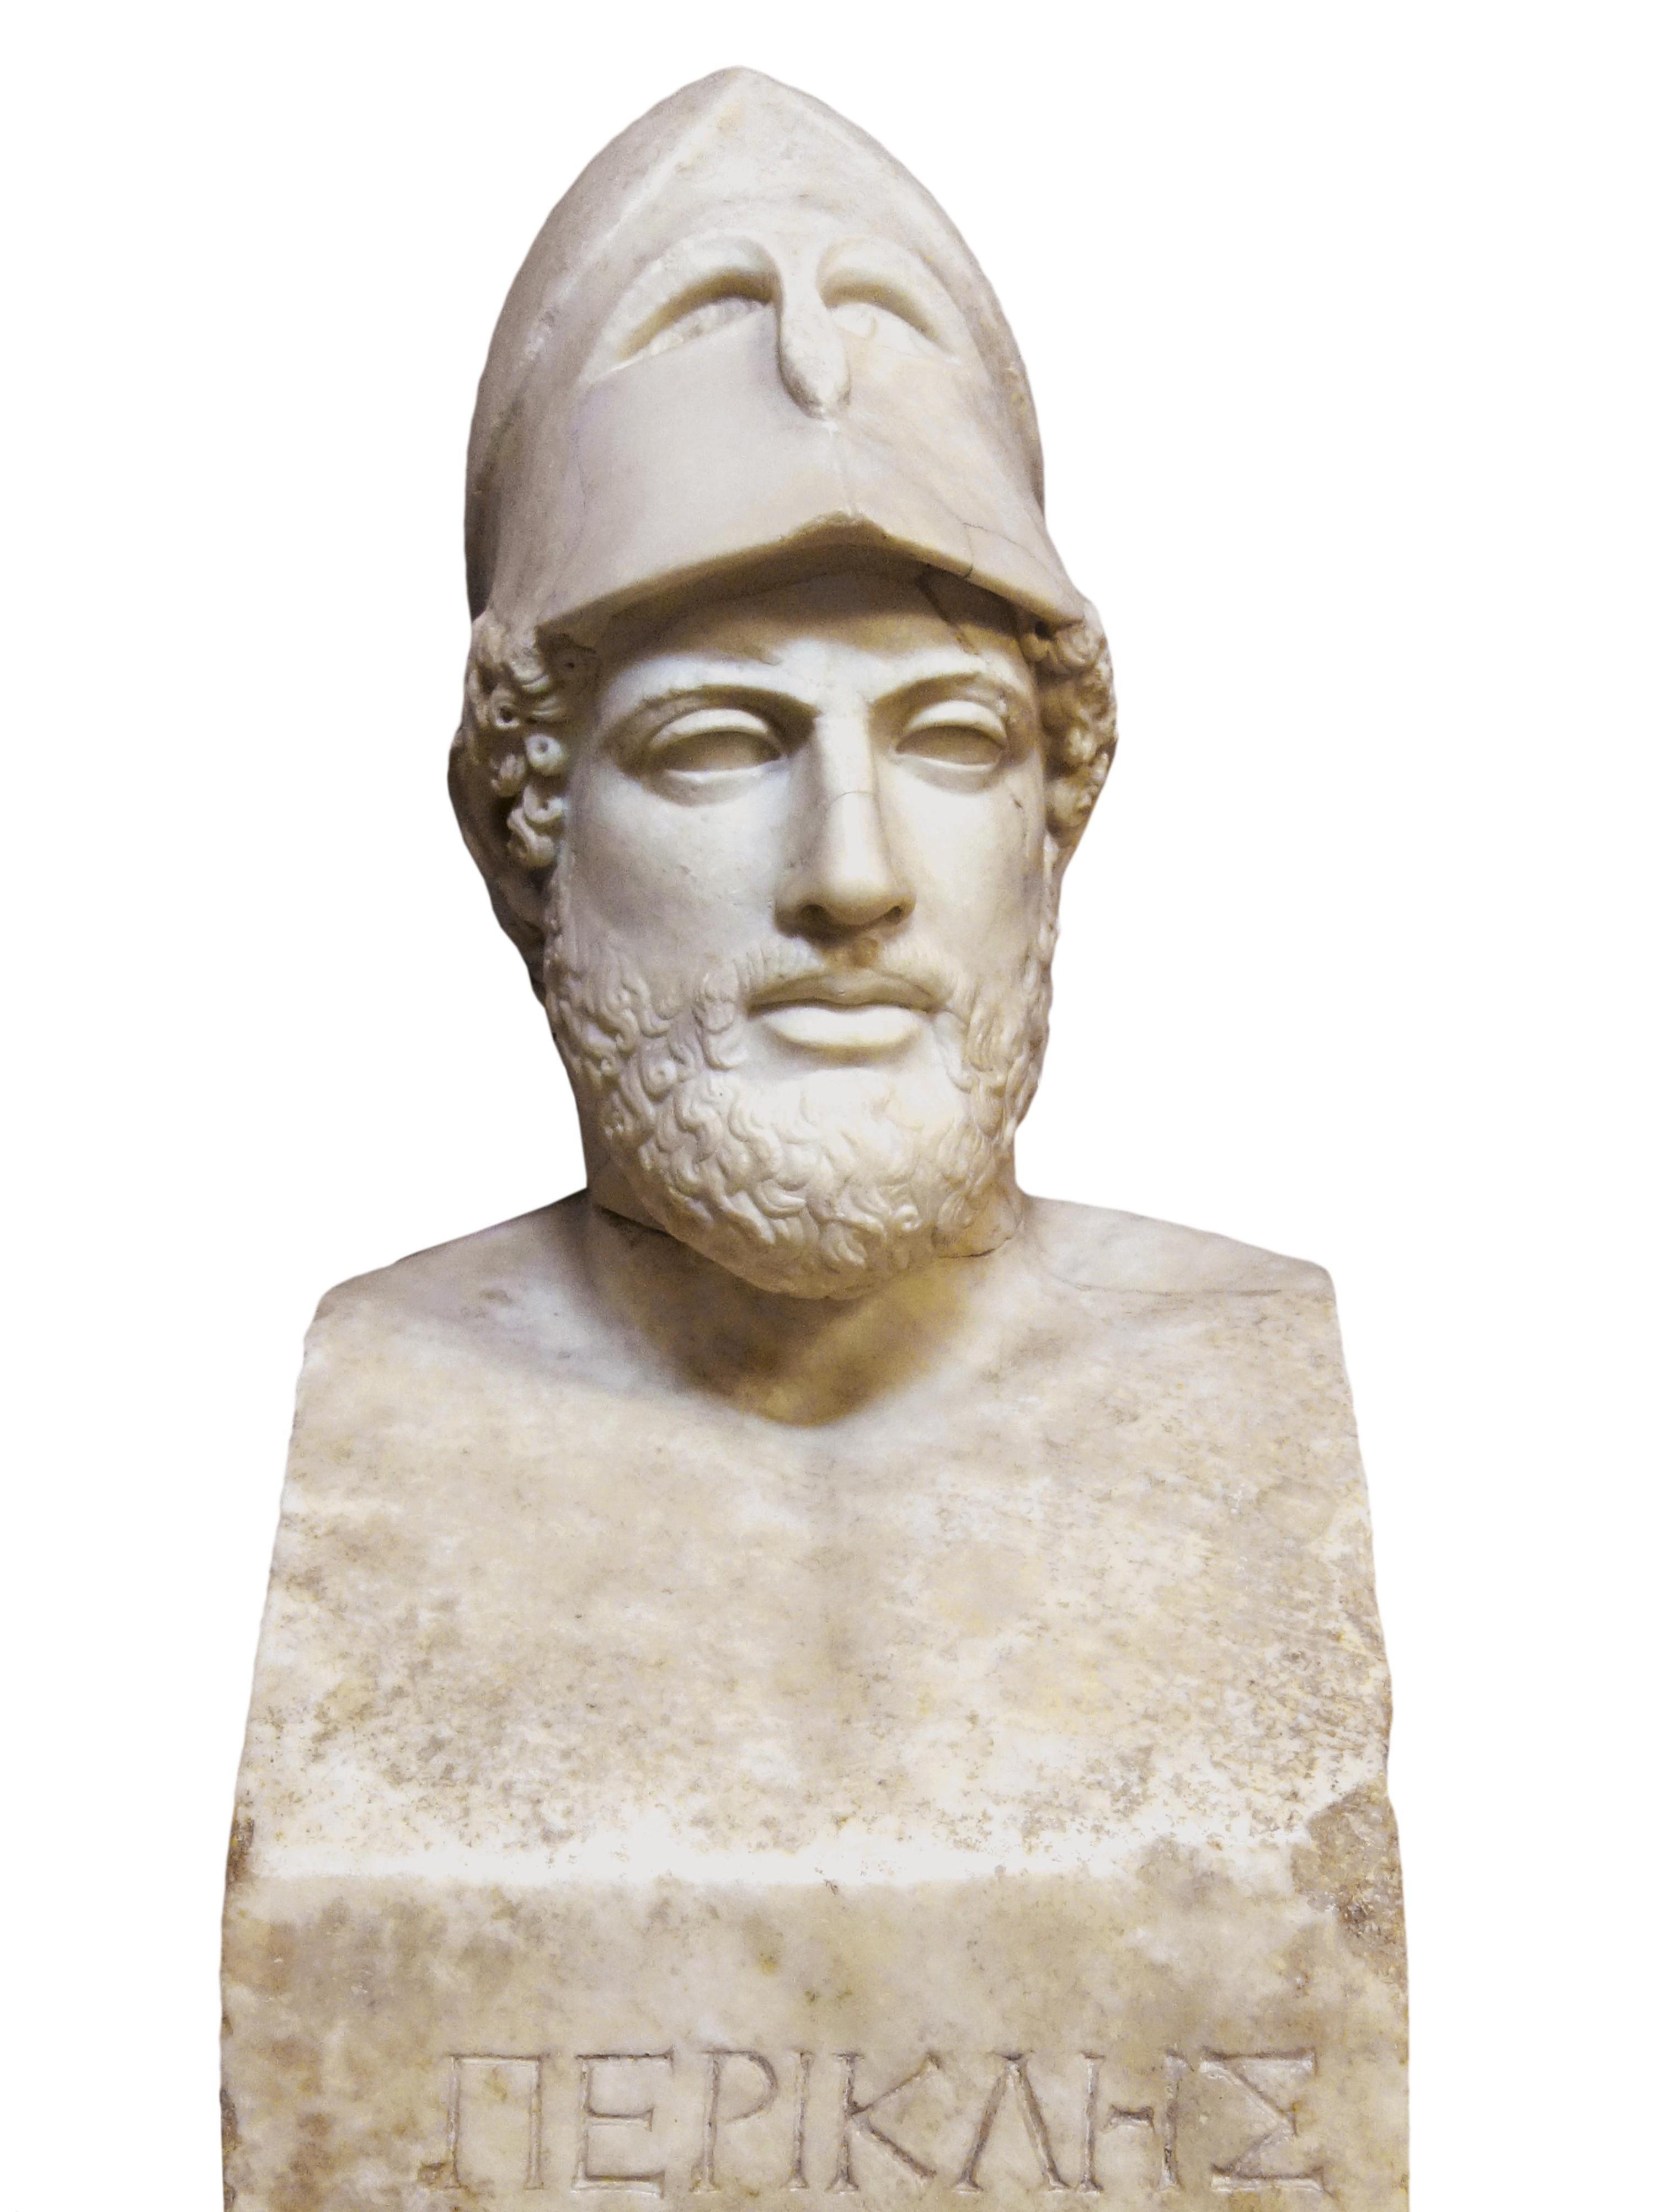 Périclès (stratège de 443 à 429 avant J.-C.)